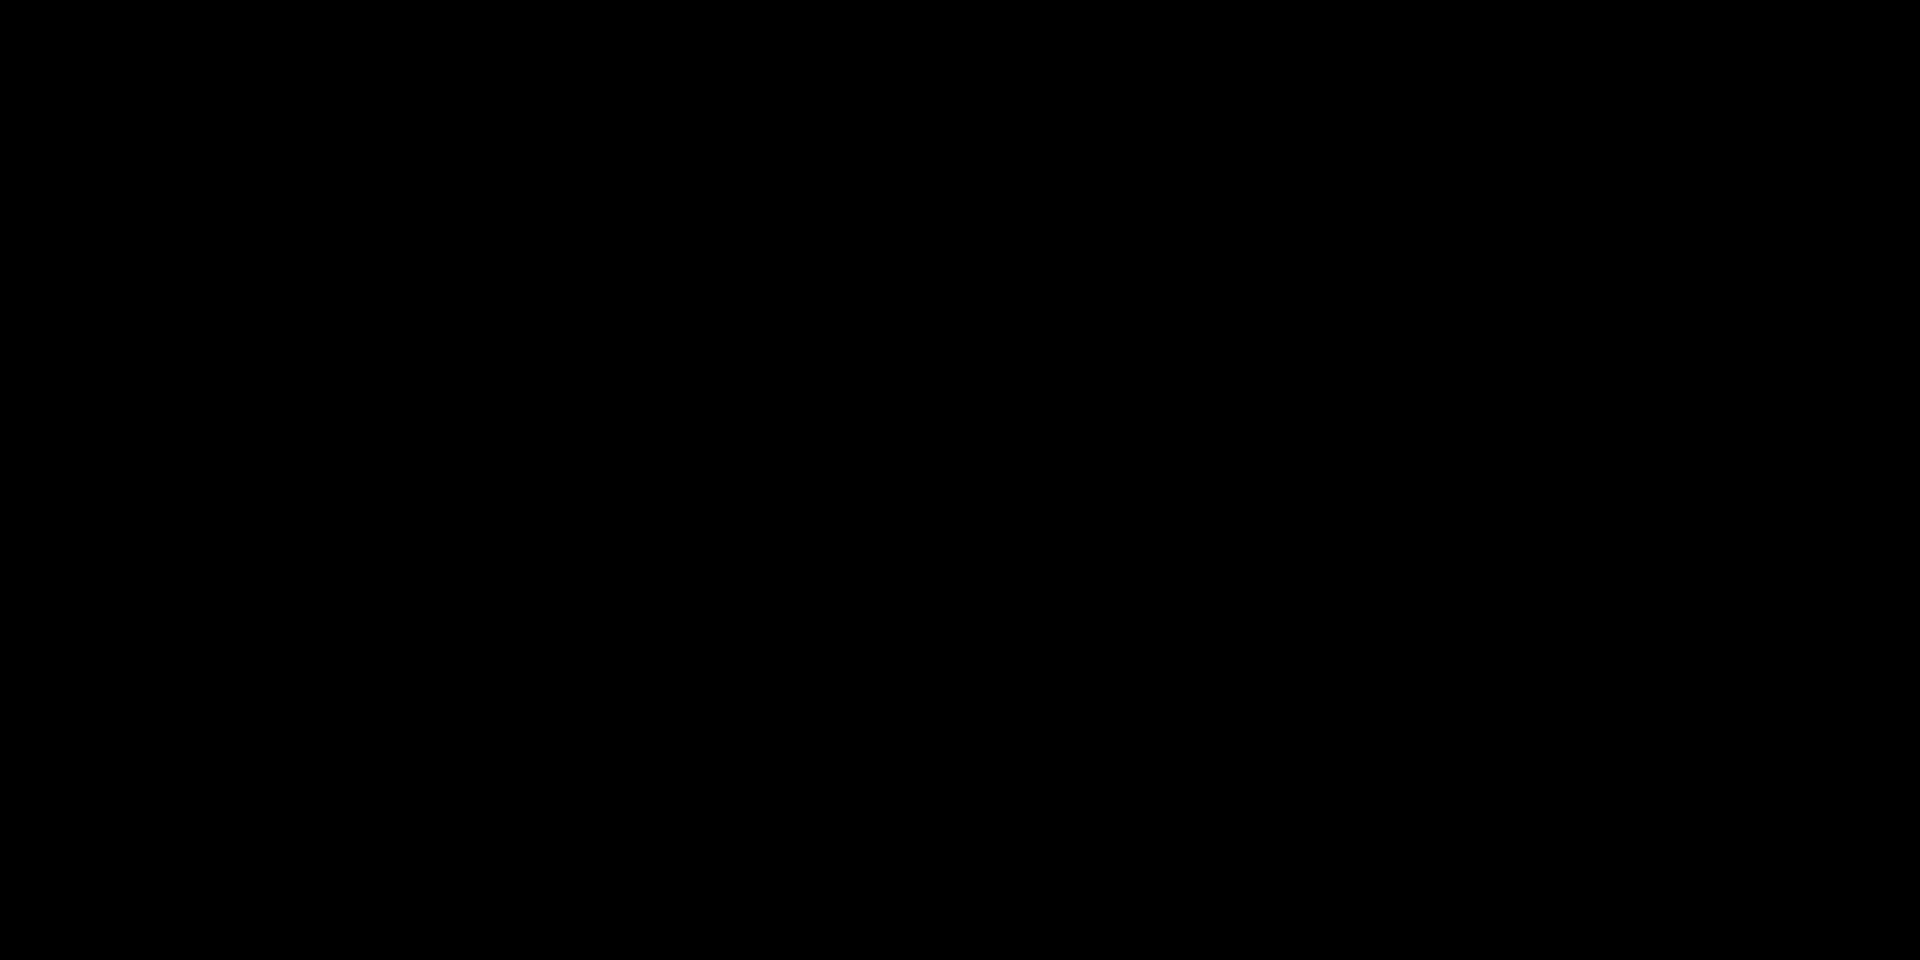 provocari zodii 2019 - sfatulparintilor.ro - pixabay_com - silhouette-3333895